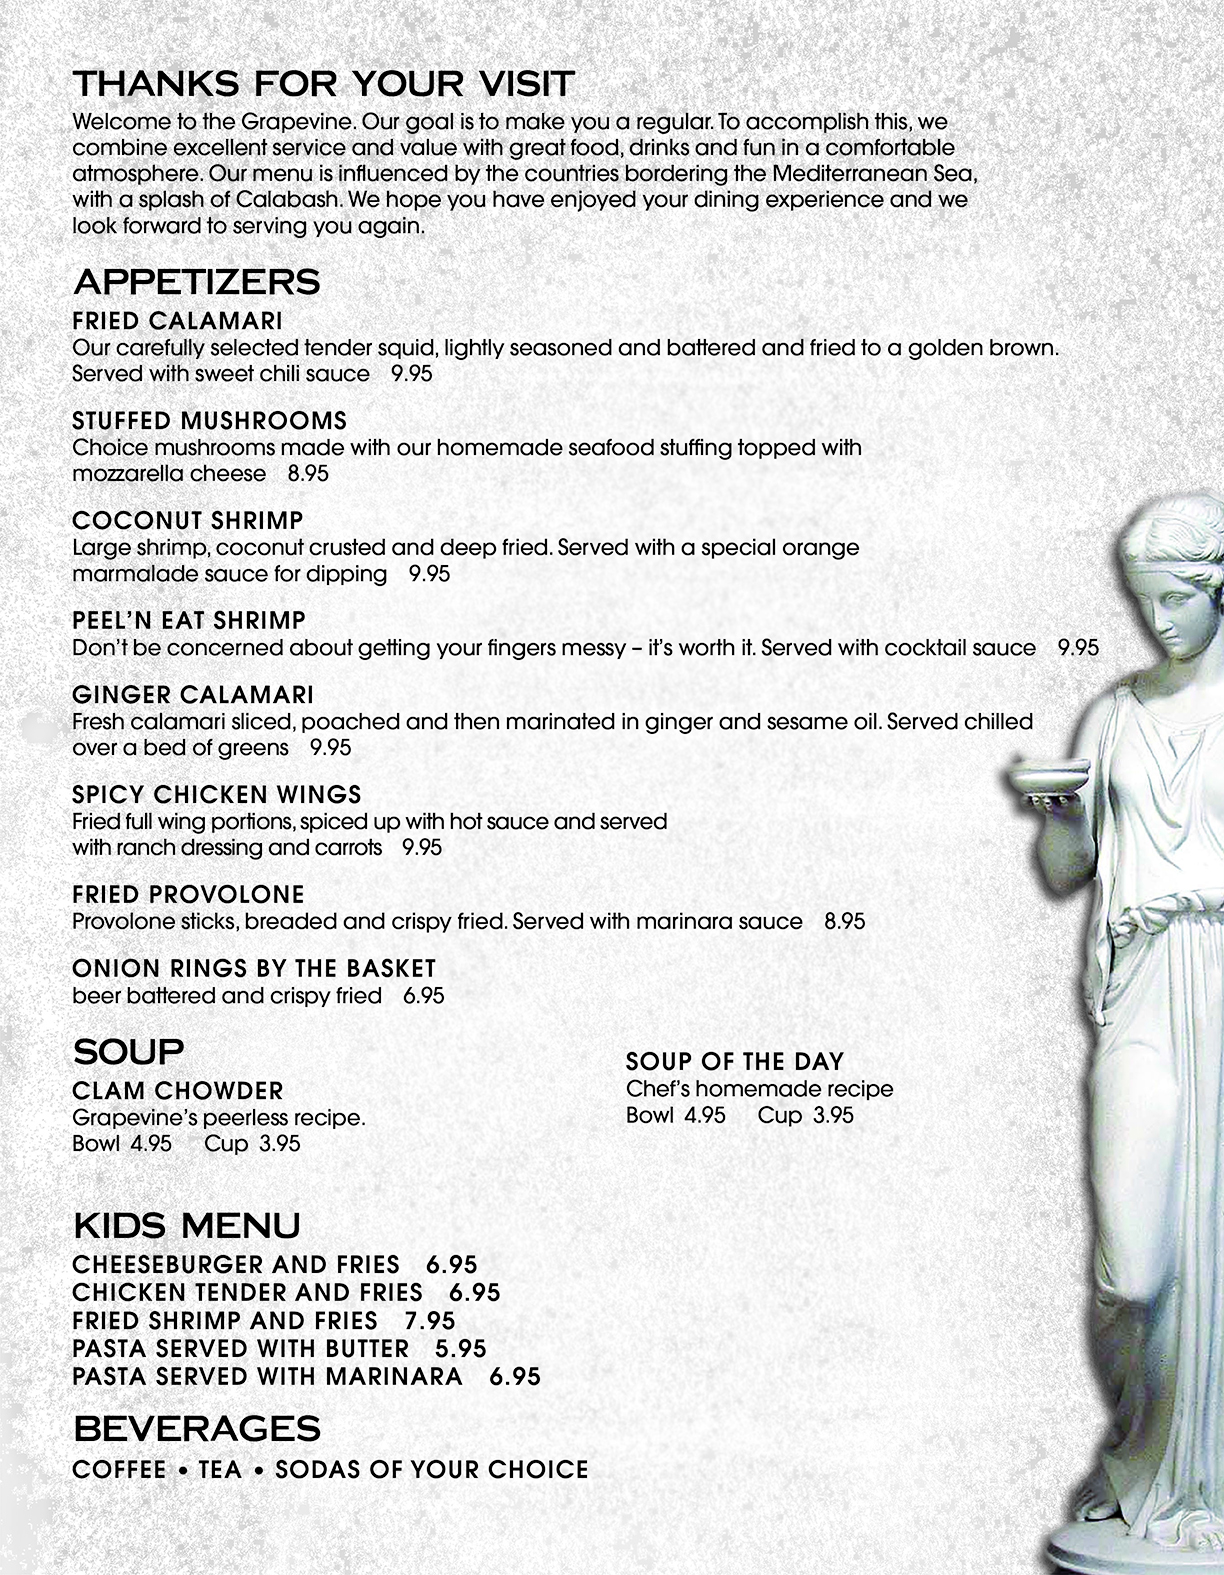 Grapevine Restaurant Calabash NC Appetizer Menu